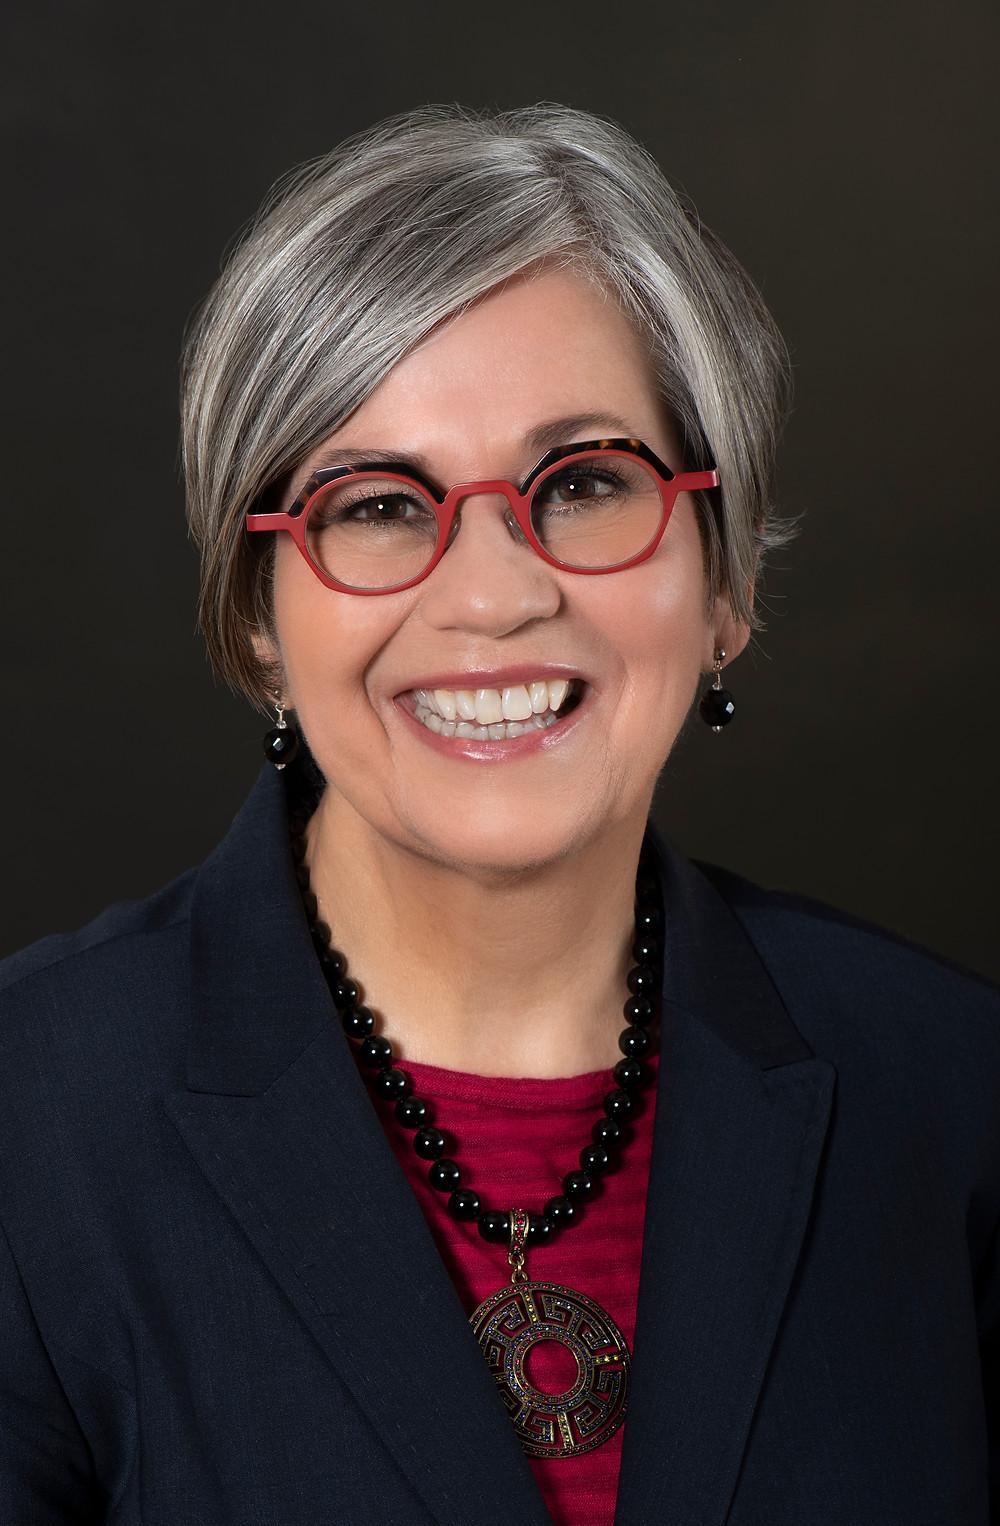 Rev. Deborah Warren, Sydnor Thomson Jr Community Leader Award 2021, MeckMIN